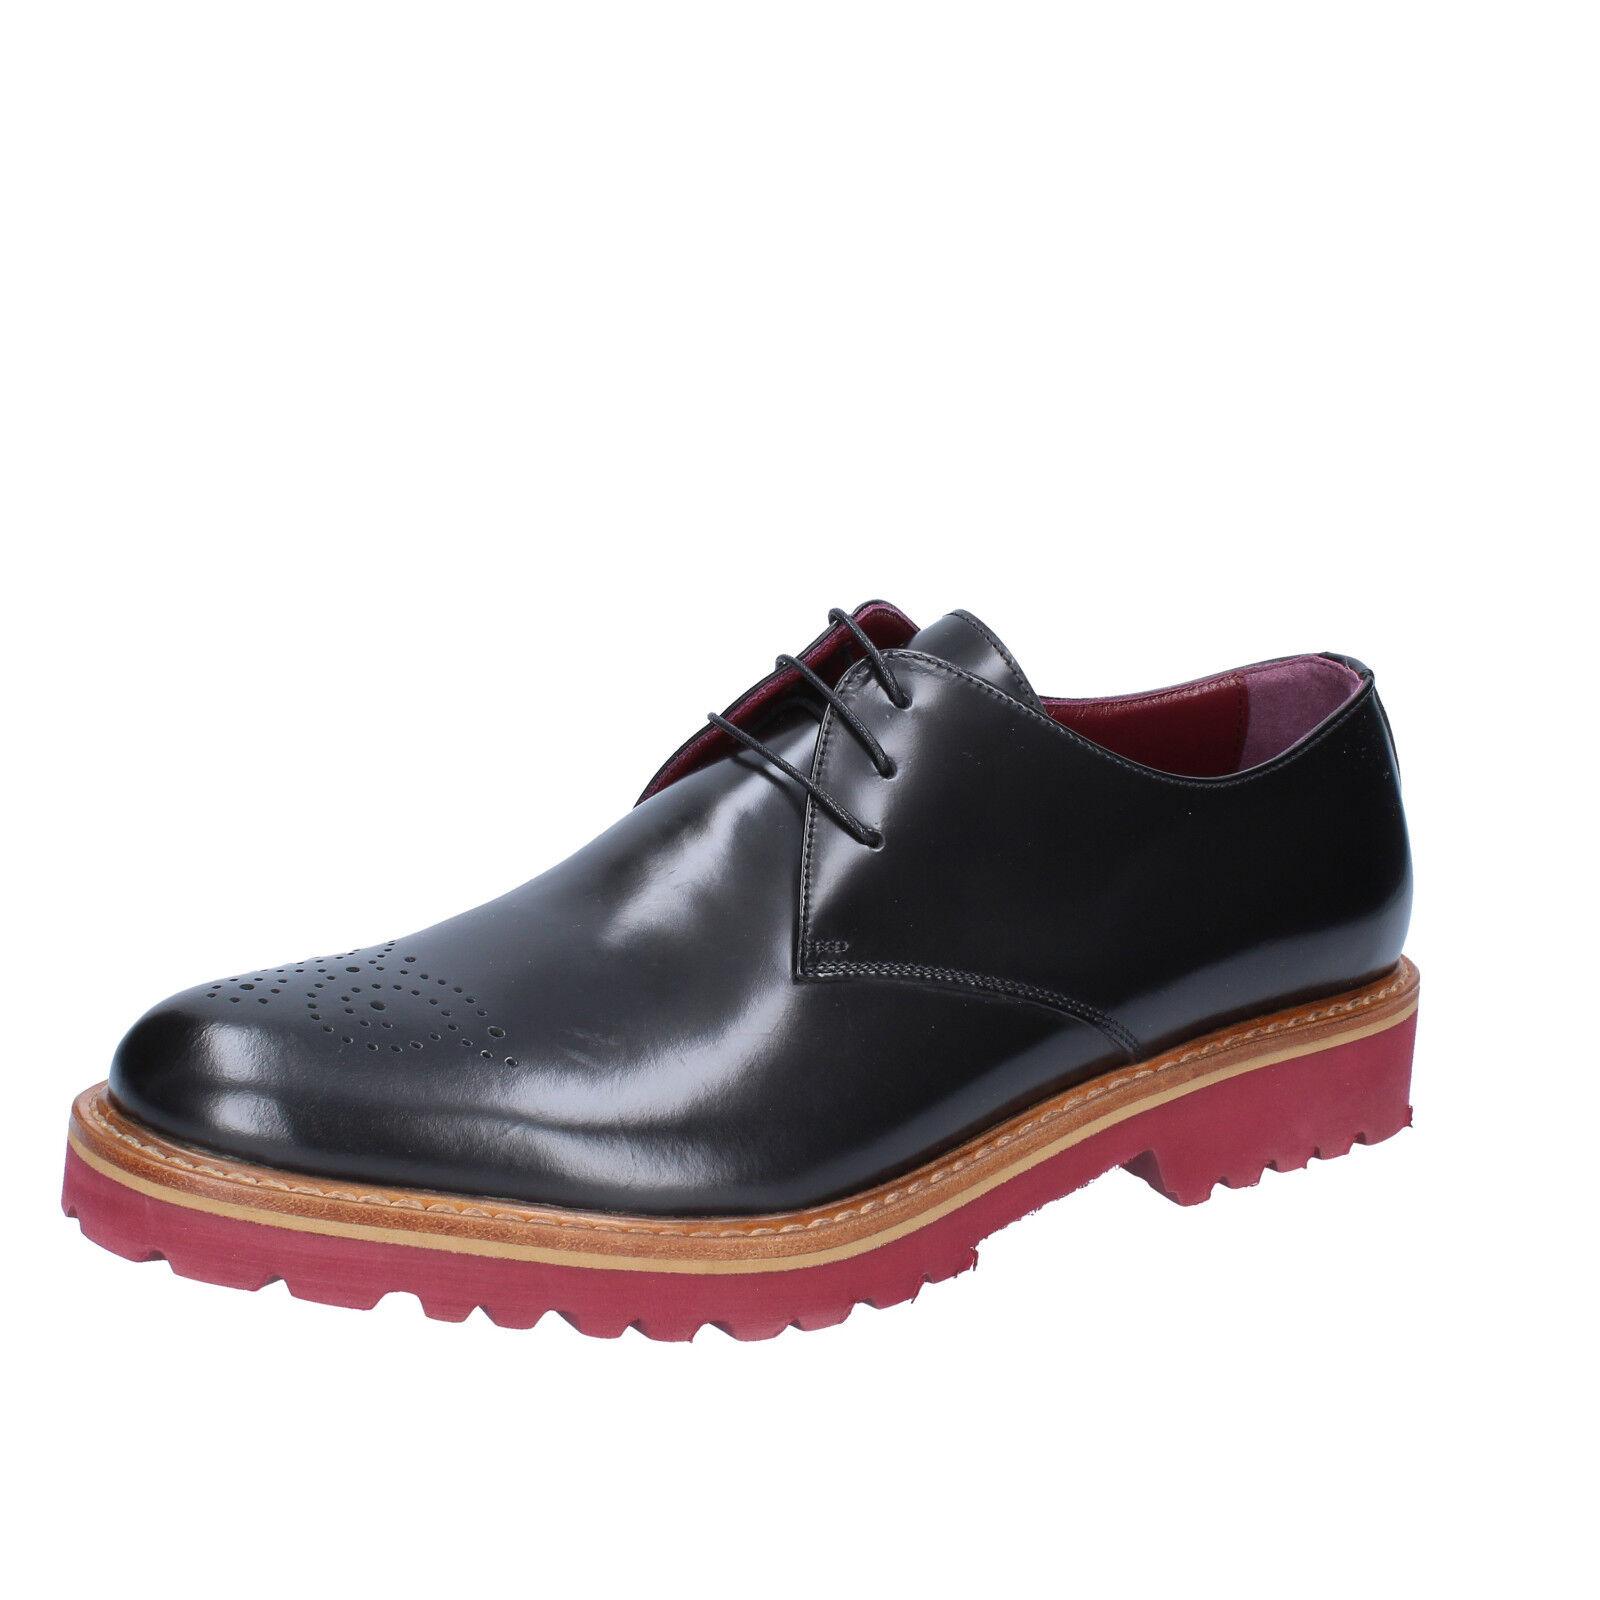 men's shoes DI MELLA 12 () elegant black leather BZ06-E